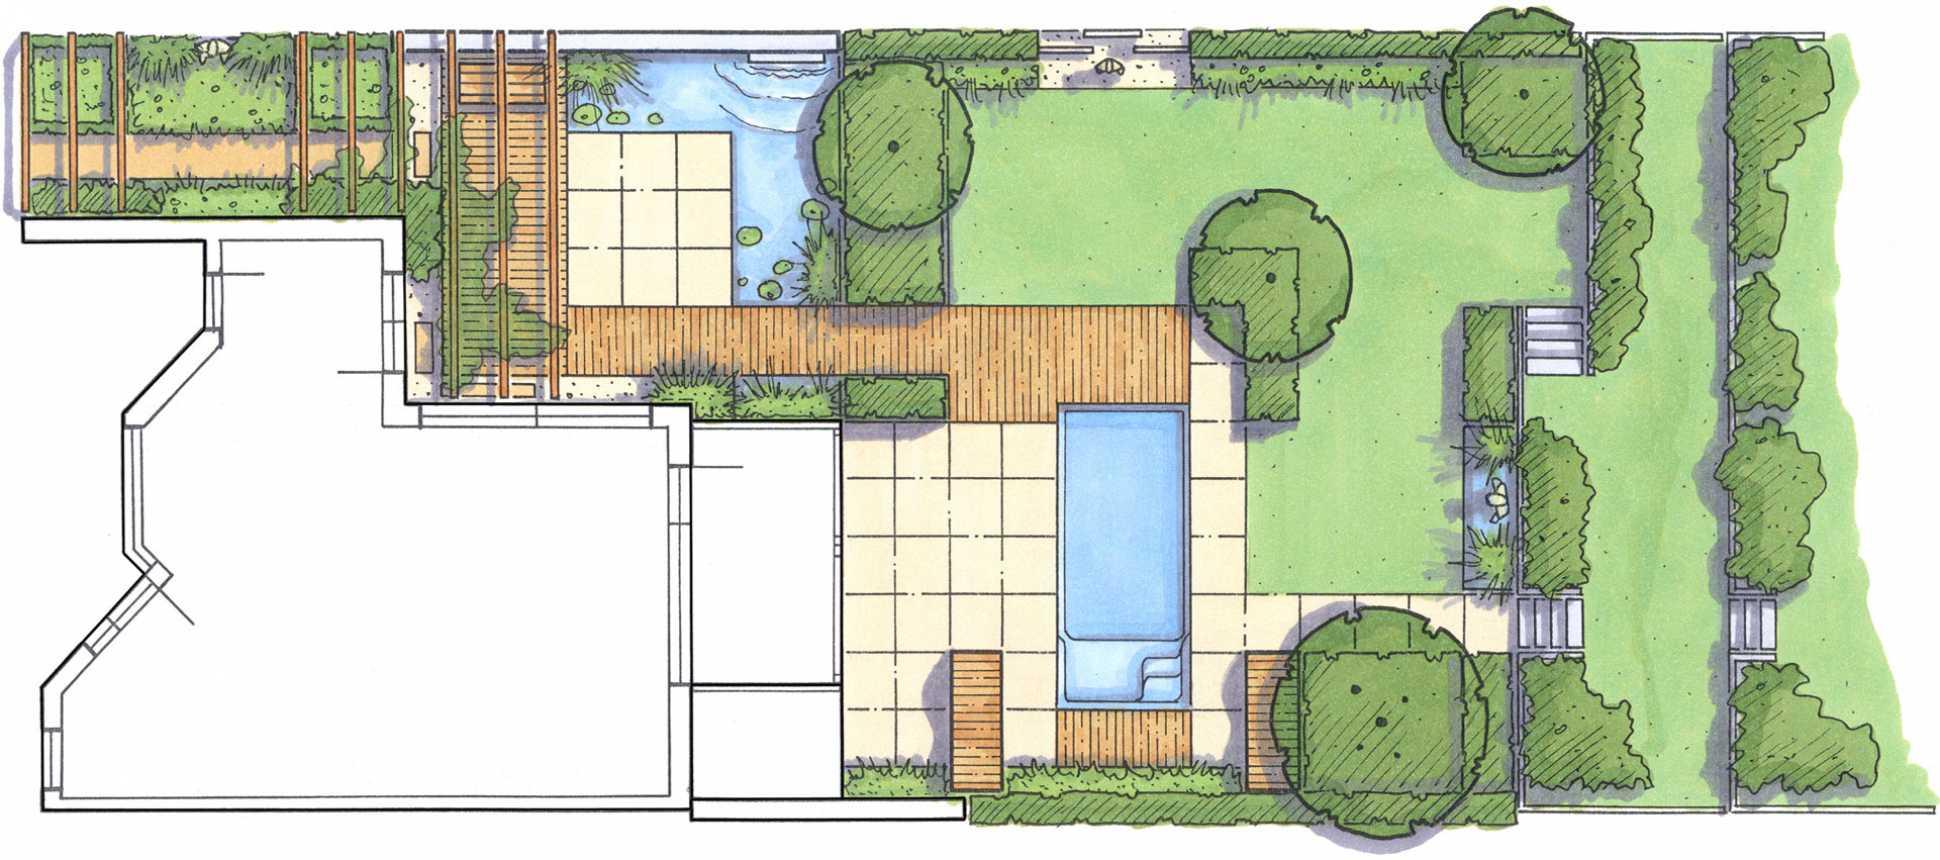 Schwimmbadbau Architekten Swimming Pool